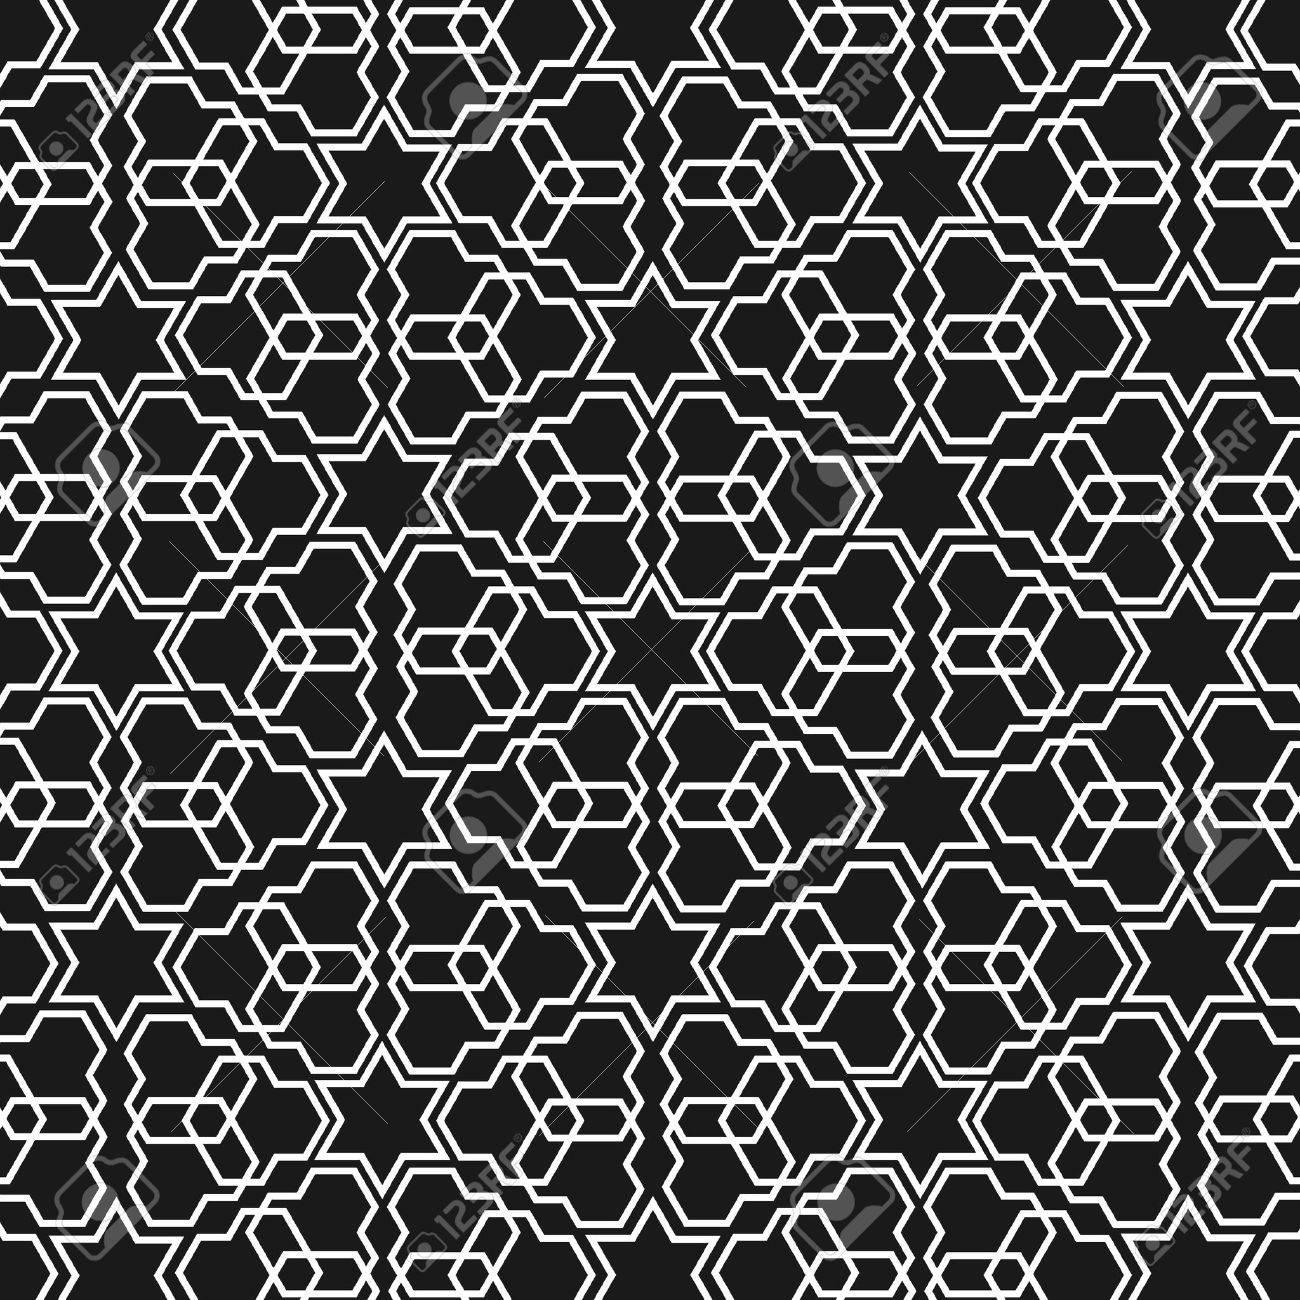 Black and white islamic pattern - 14209931